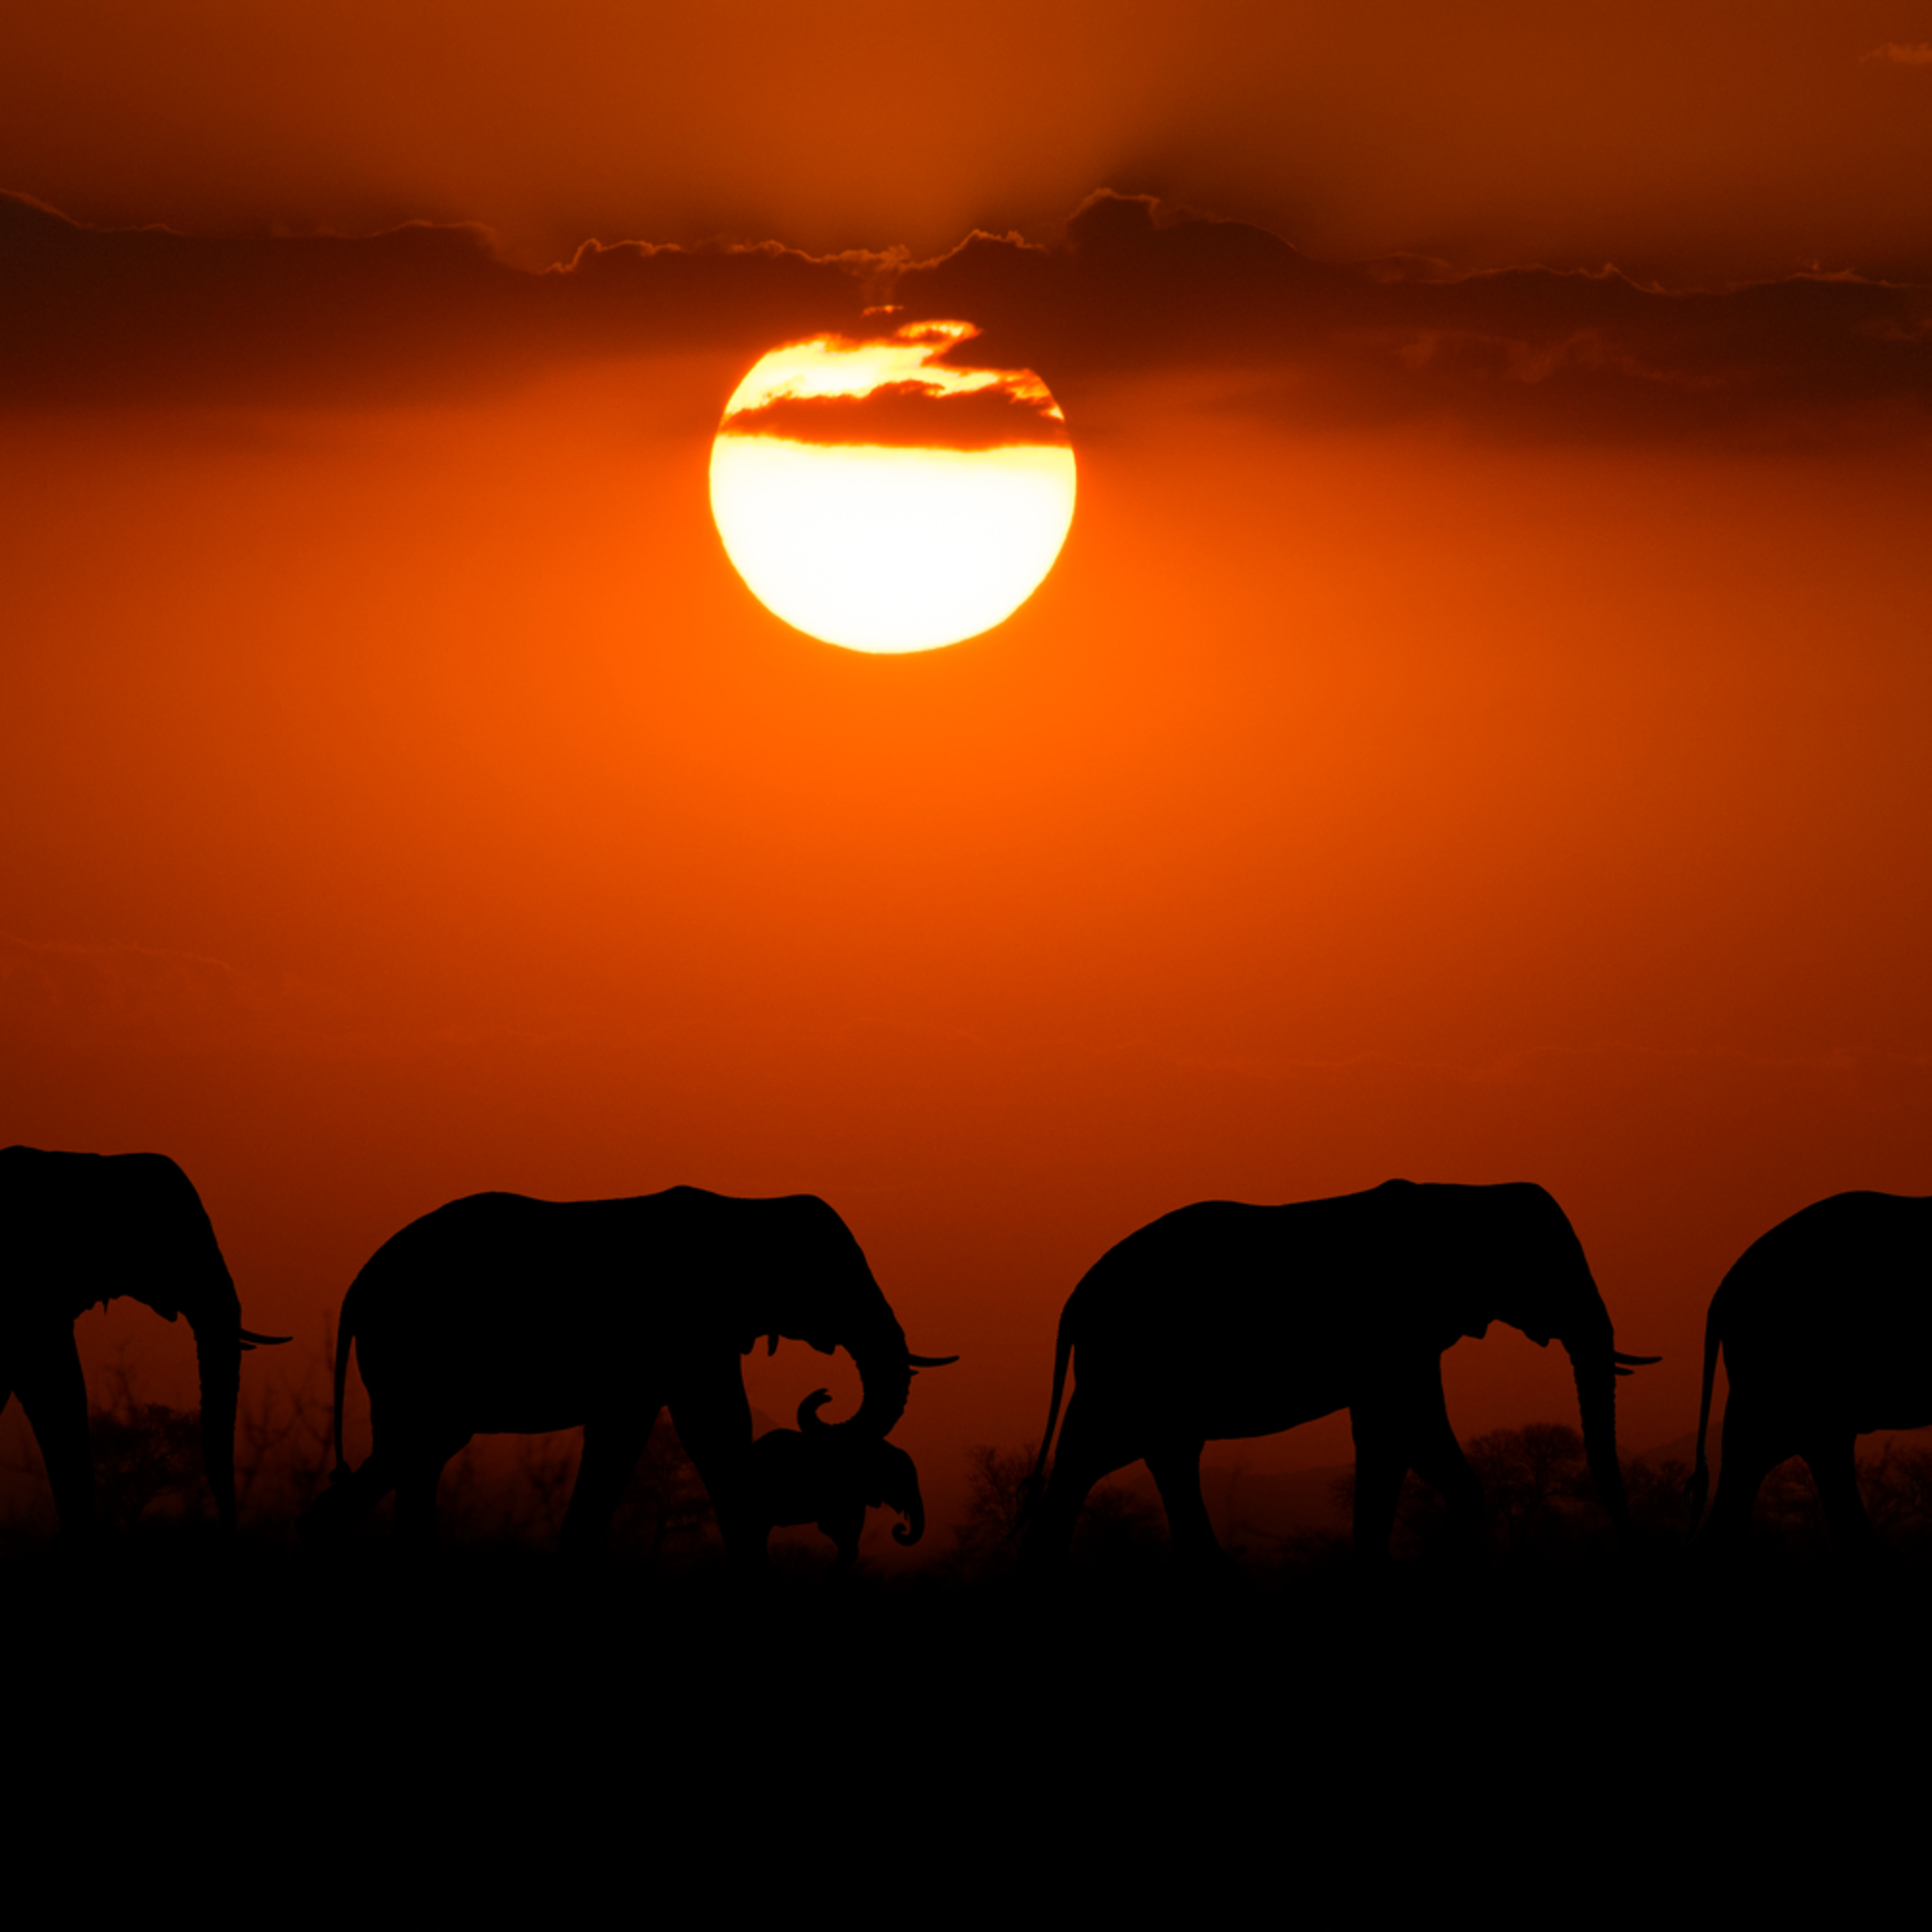 Elephants silhouette sun v2 12x18 sig n5oeki